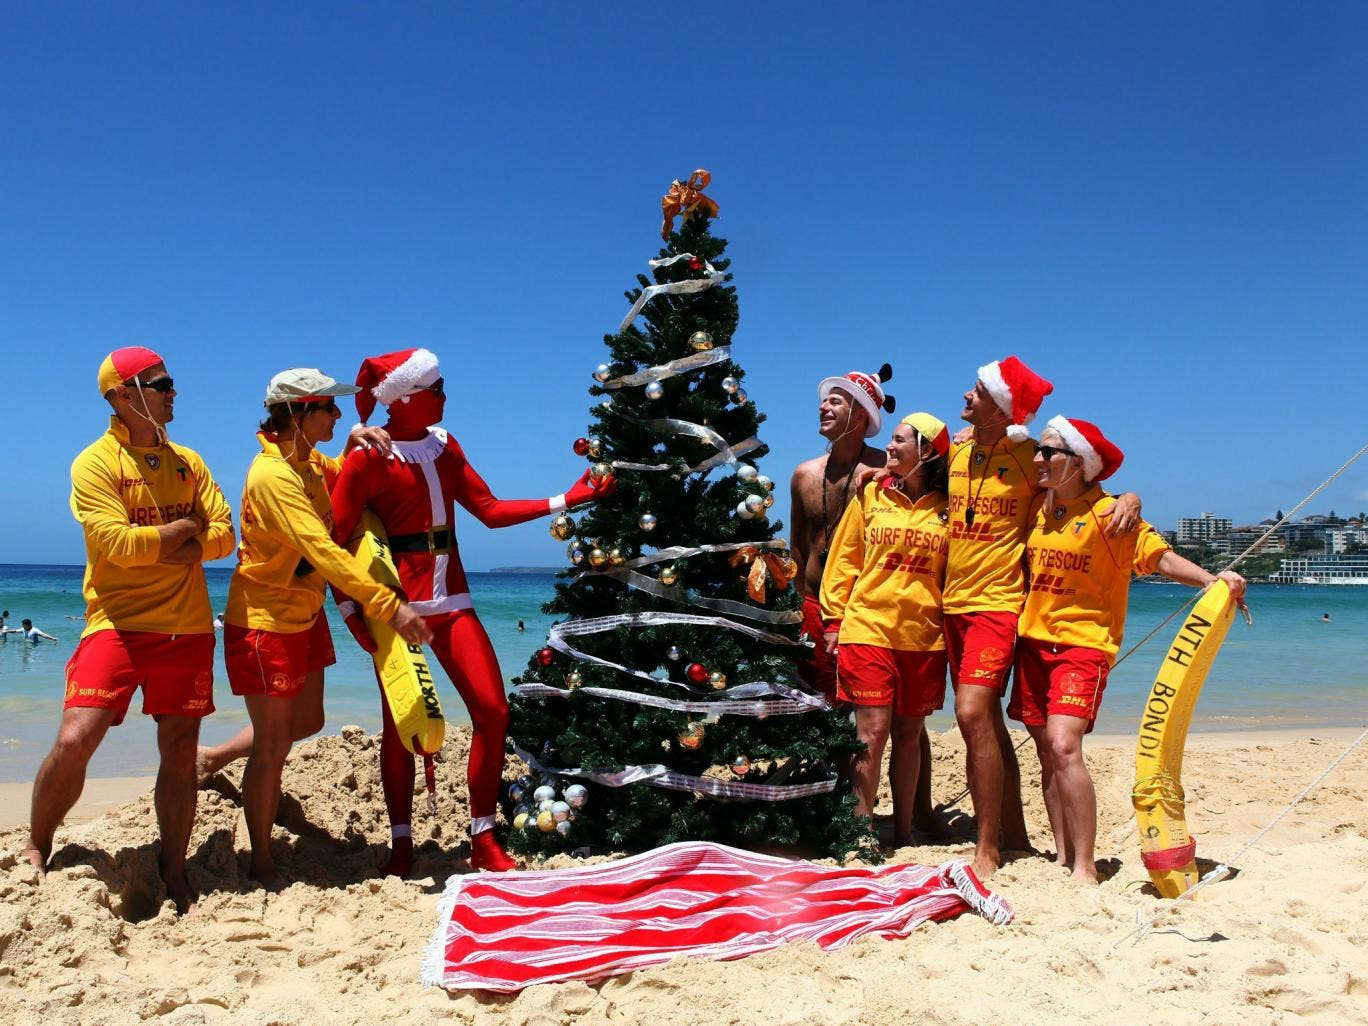 Bonzer tree: Sydney lifeguards celebrate Christmas on Bondi Beach